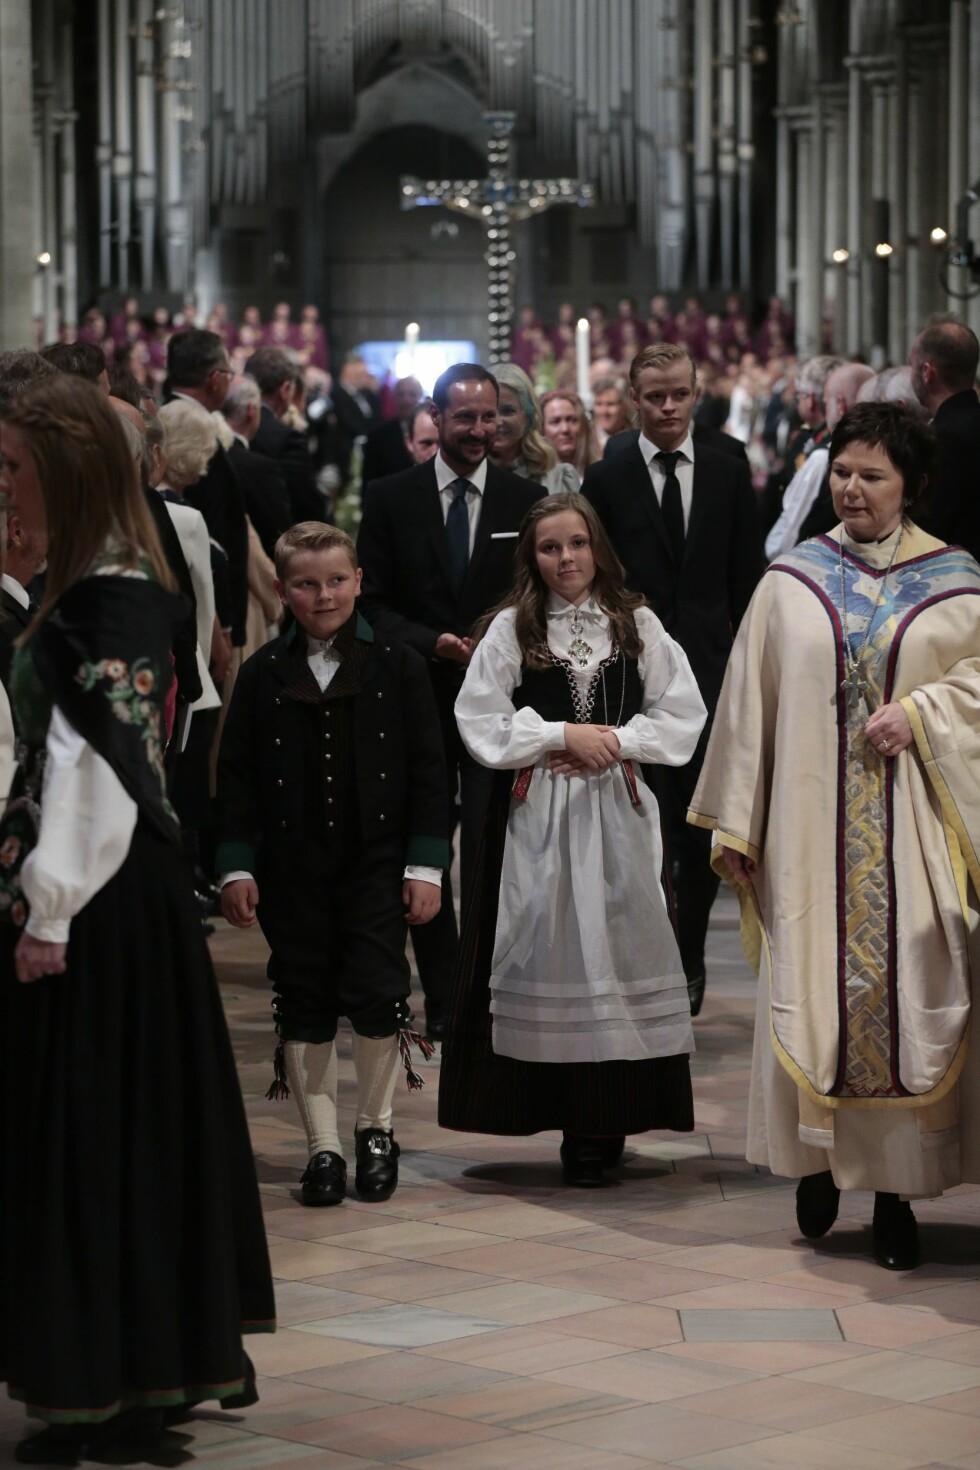 VELOPPDRAGNE: Både prins Sverre Magnus og prinsesse Ingrid Alexandra ankom Nidarosdomen i bunad, med kronprinsparet og Marius Borg Høiby like bak.   Foto: NTB scanpix